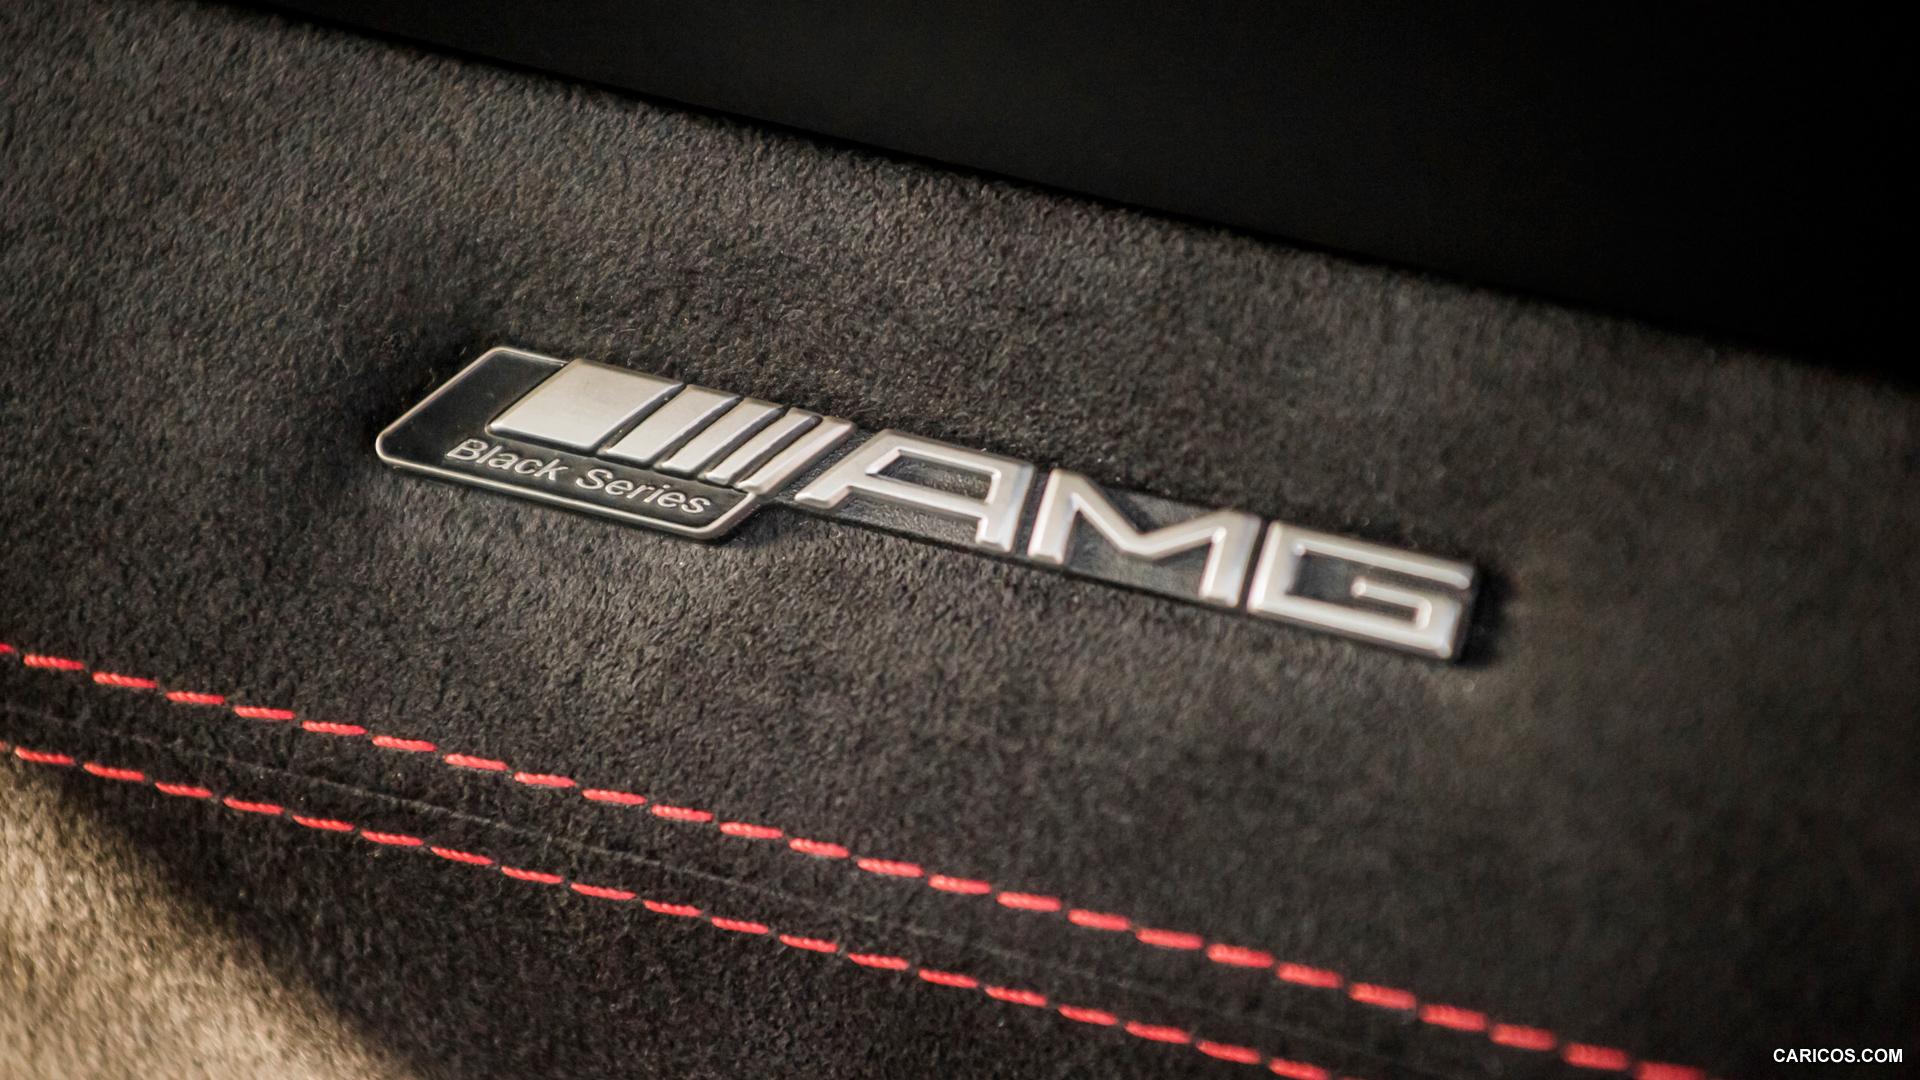 Mercedes Benz Sls Amg Coupe Black Series Photos Photo